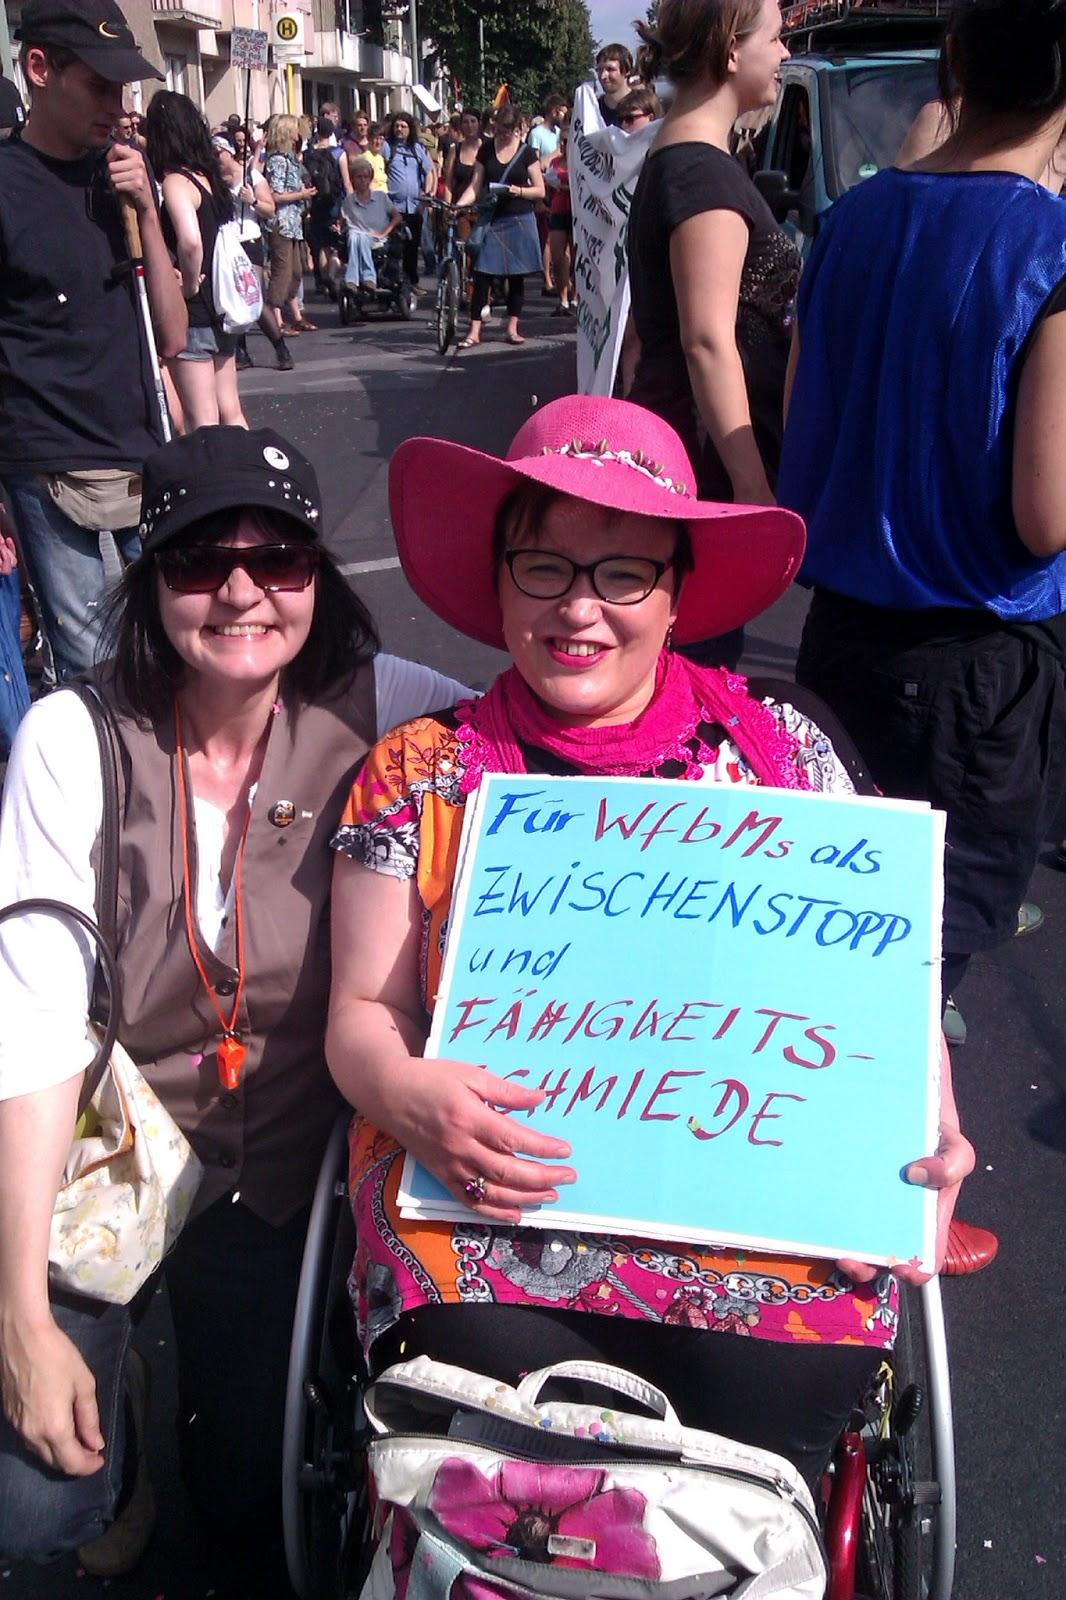 http://3.bp.blogspot.com/-Uot2MzdyF1M/UeIfnrJ0-OI/AAAAAAAAAfk/Cz06CRTN9CI/s1600/PrideParade.jpg